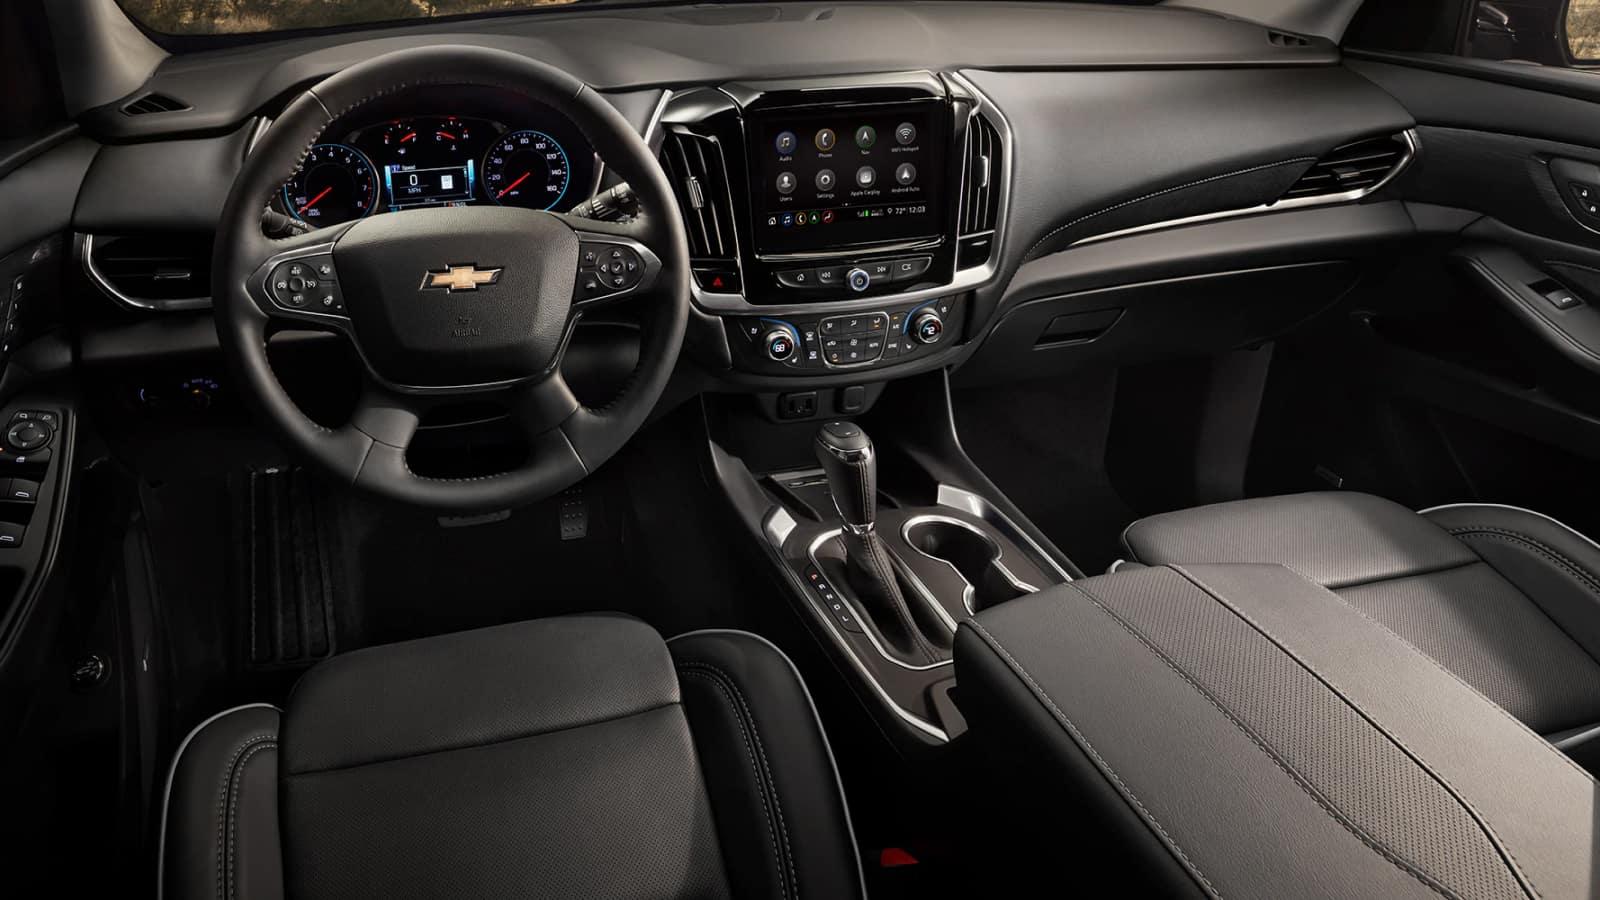 2020 Chevrolet Traverse For Sale In Pensacola, FL